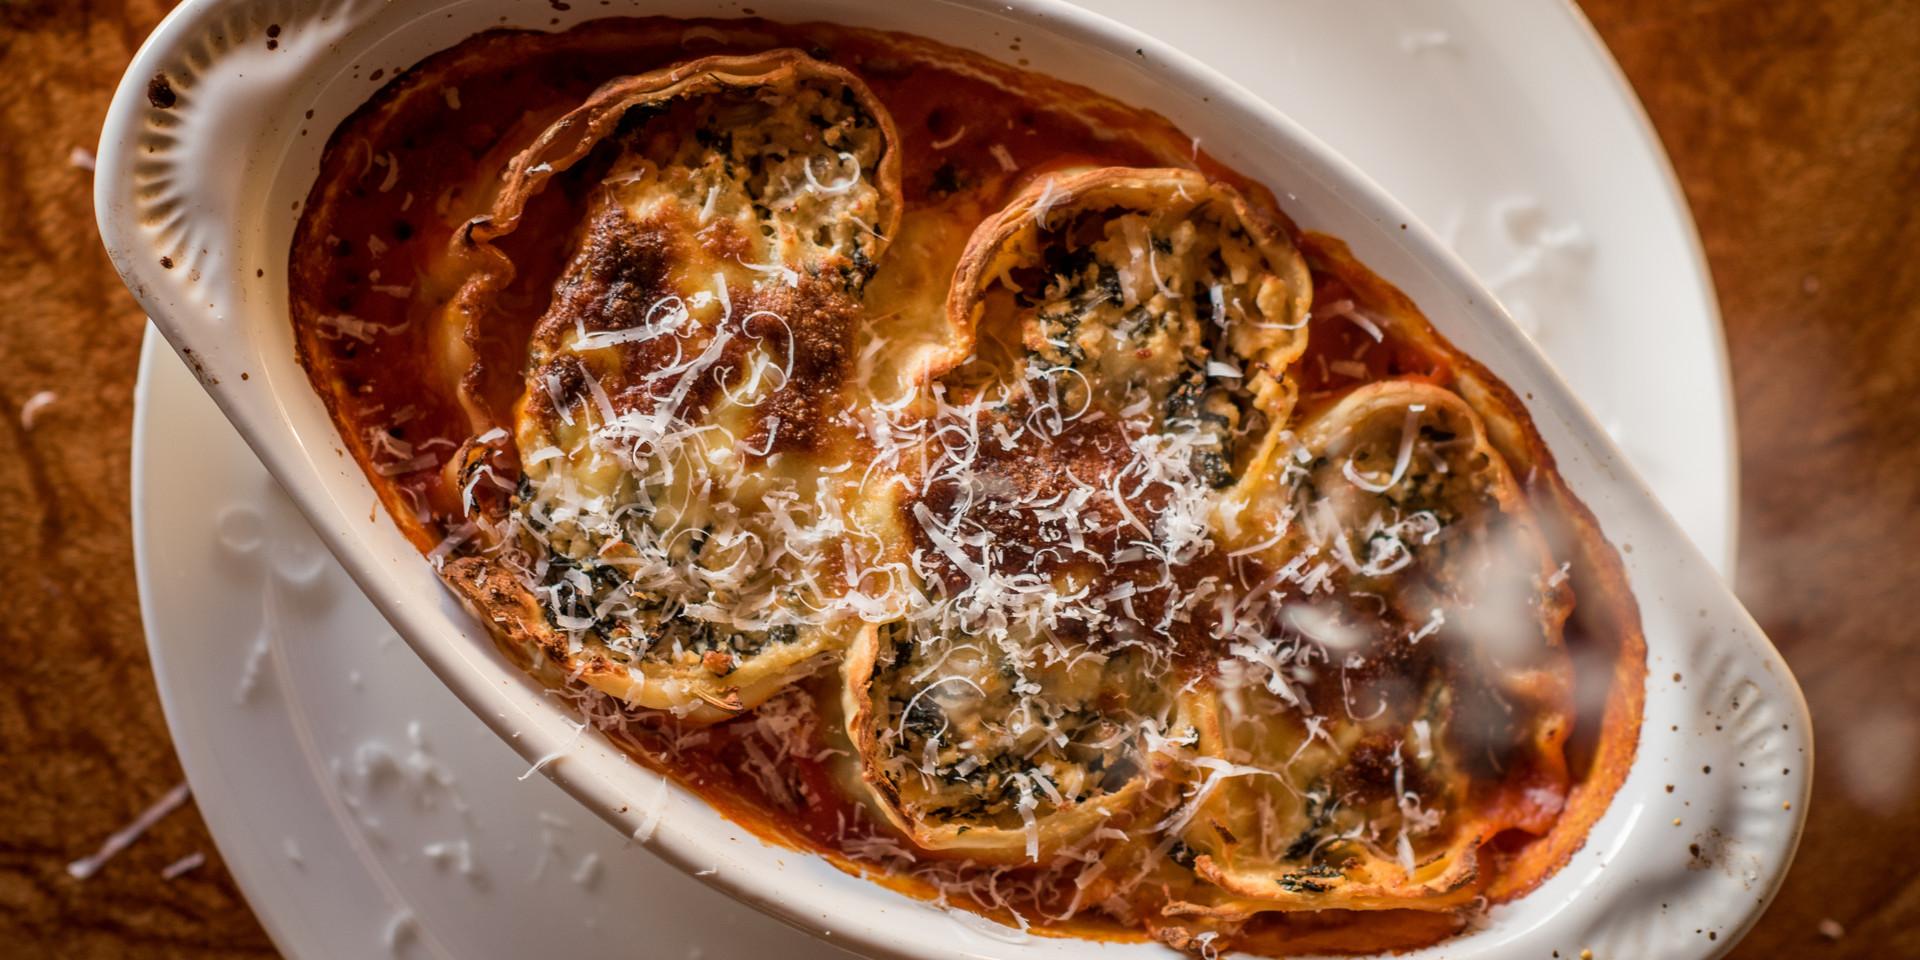 Main - veg option - spinach and ricotta